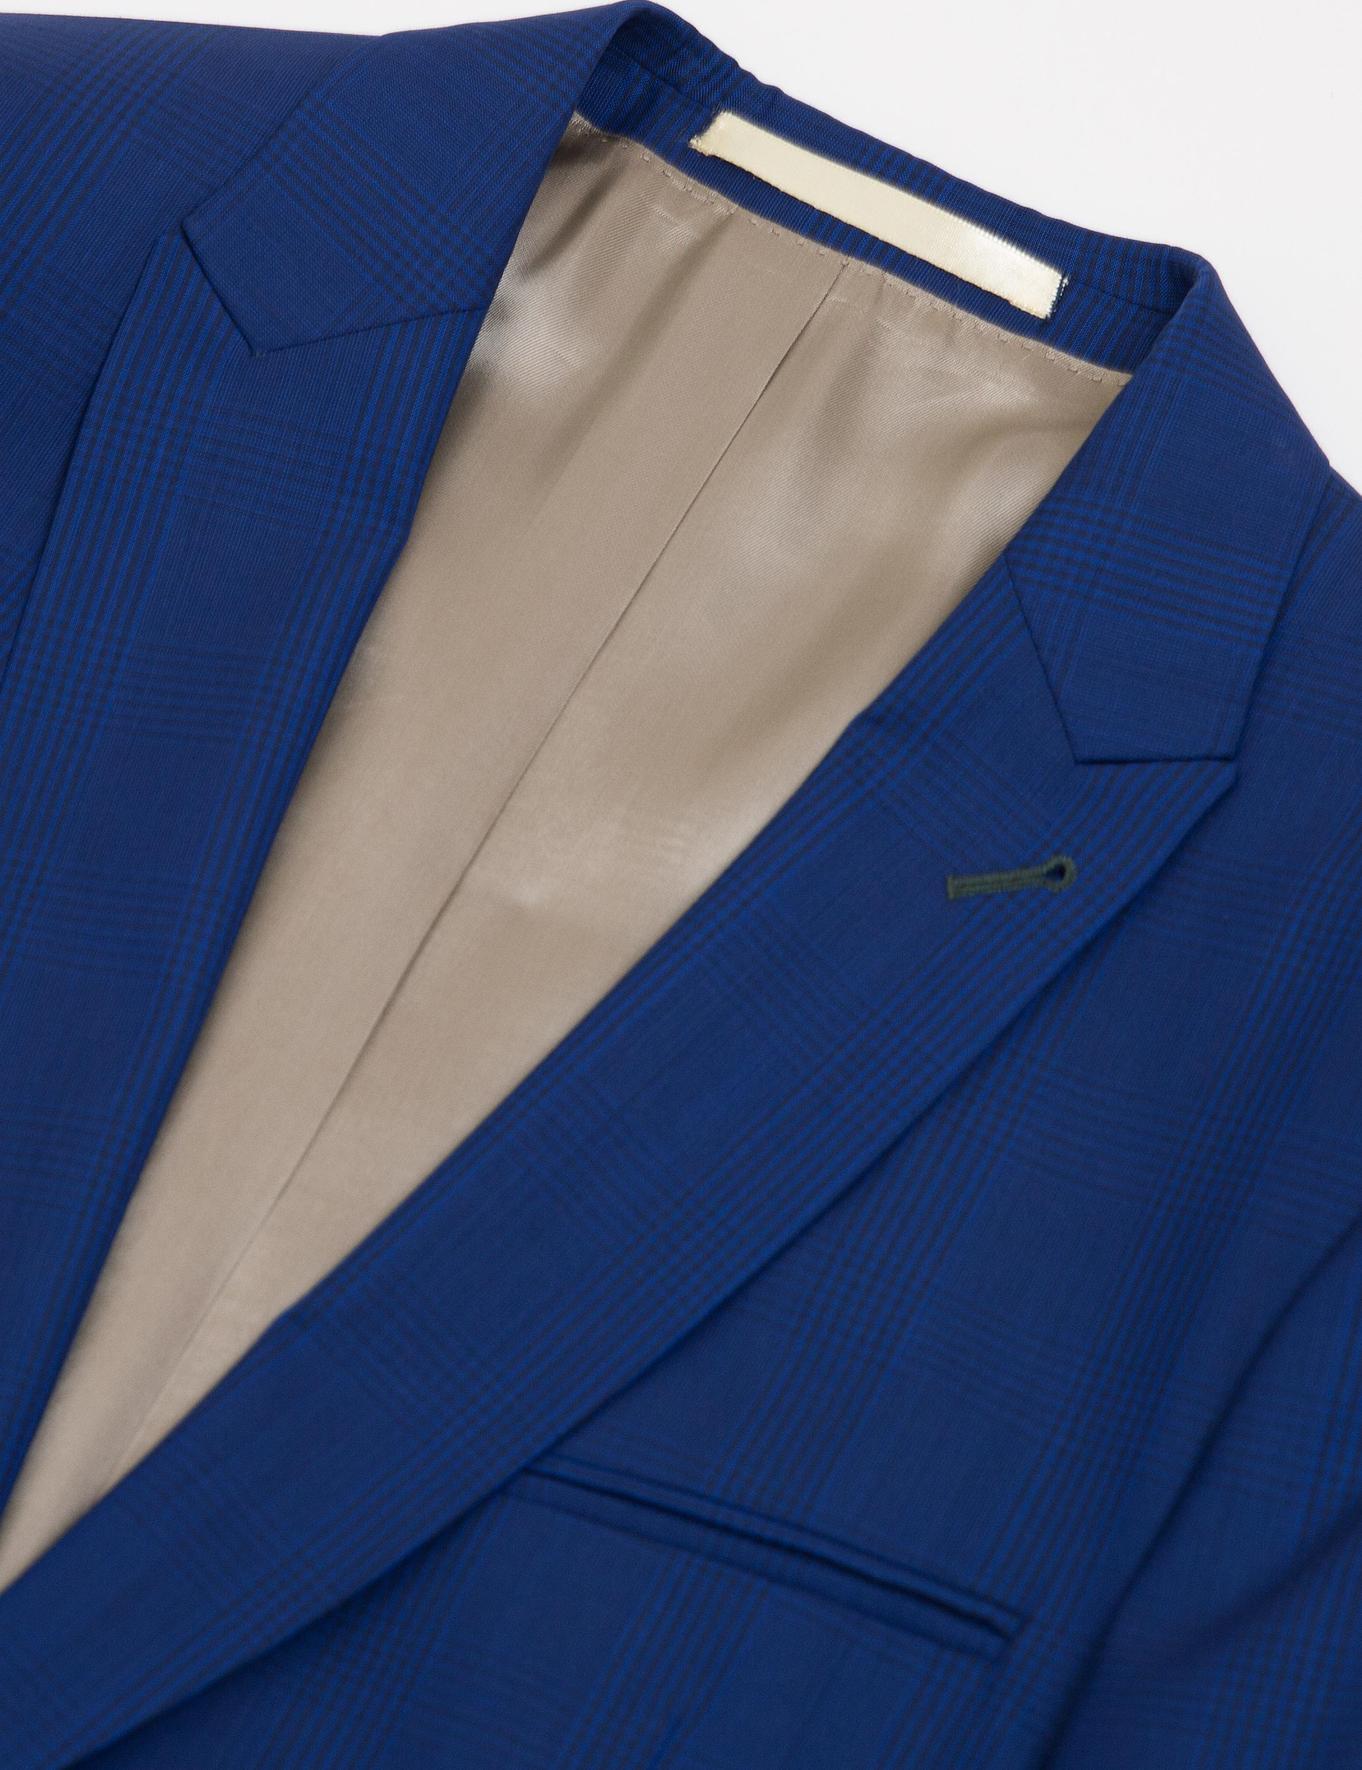 Açık Lacivert Slim Fit Takım Elbise - 50185602002